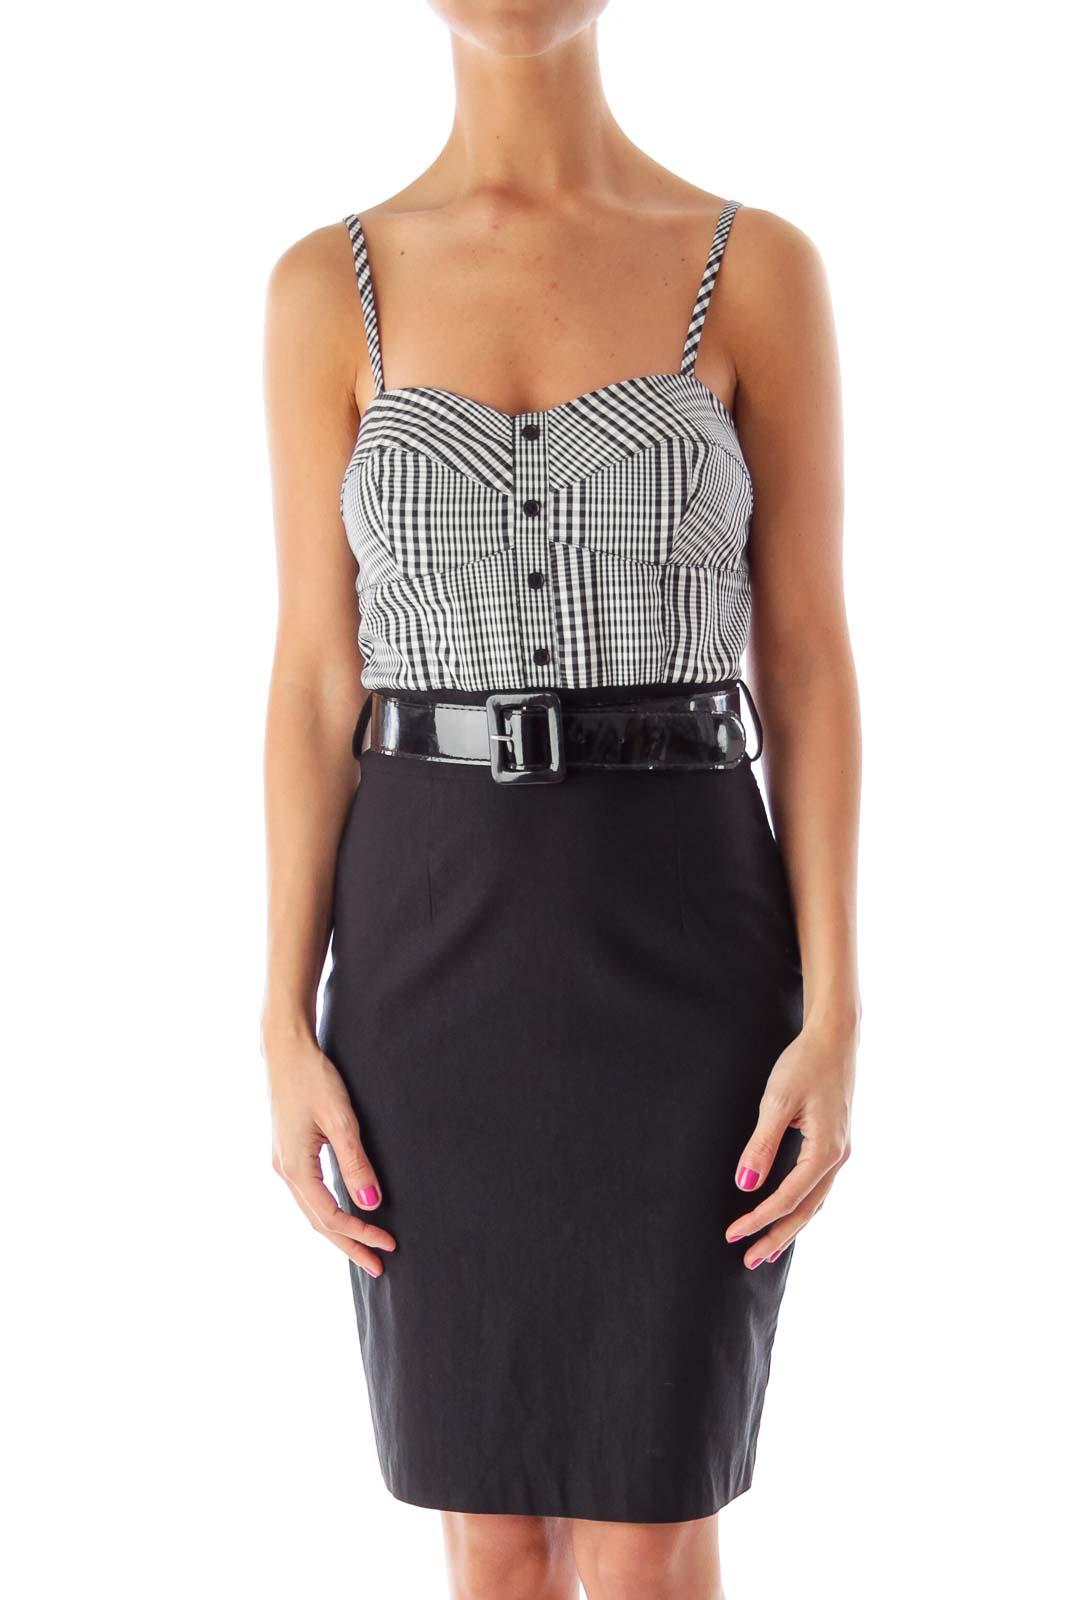 Black & White Plaid Dress Front